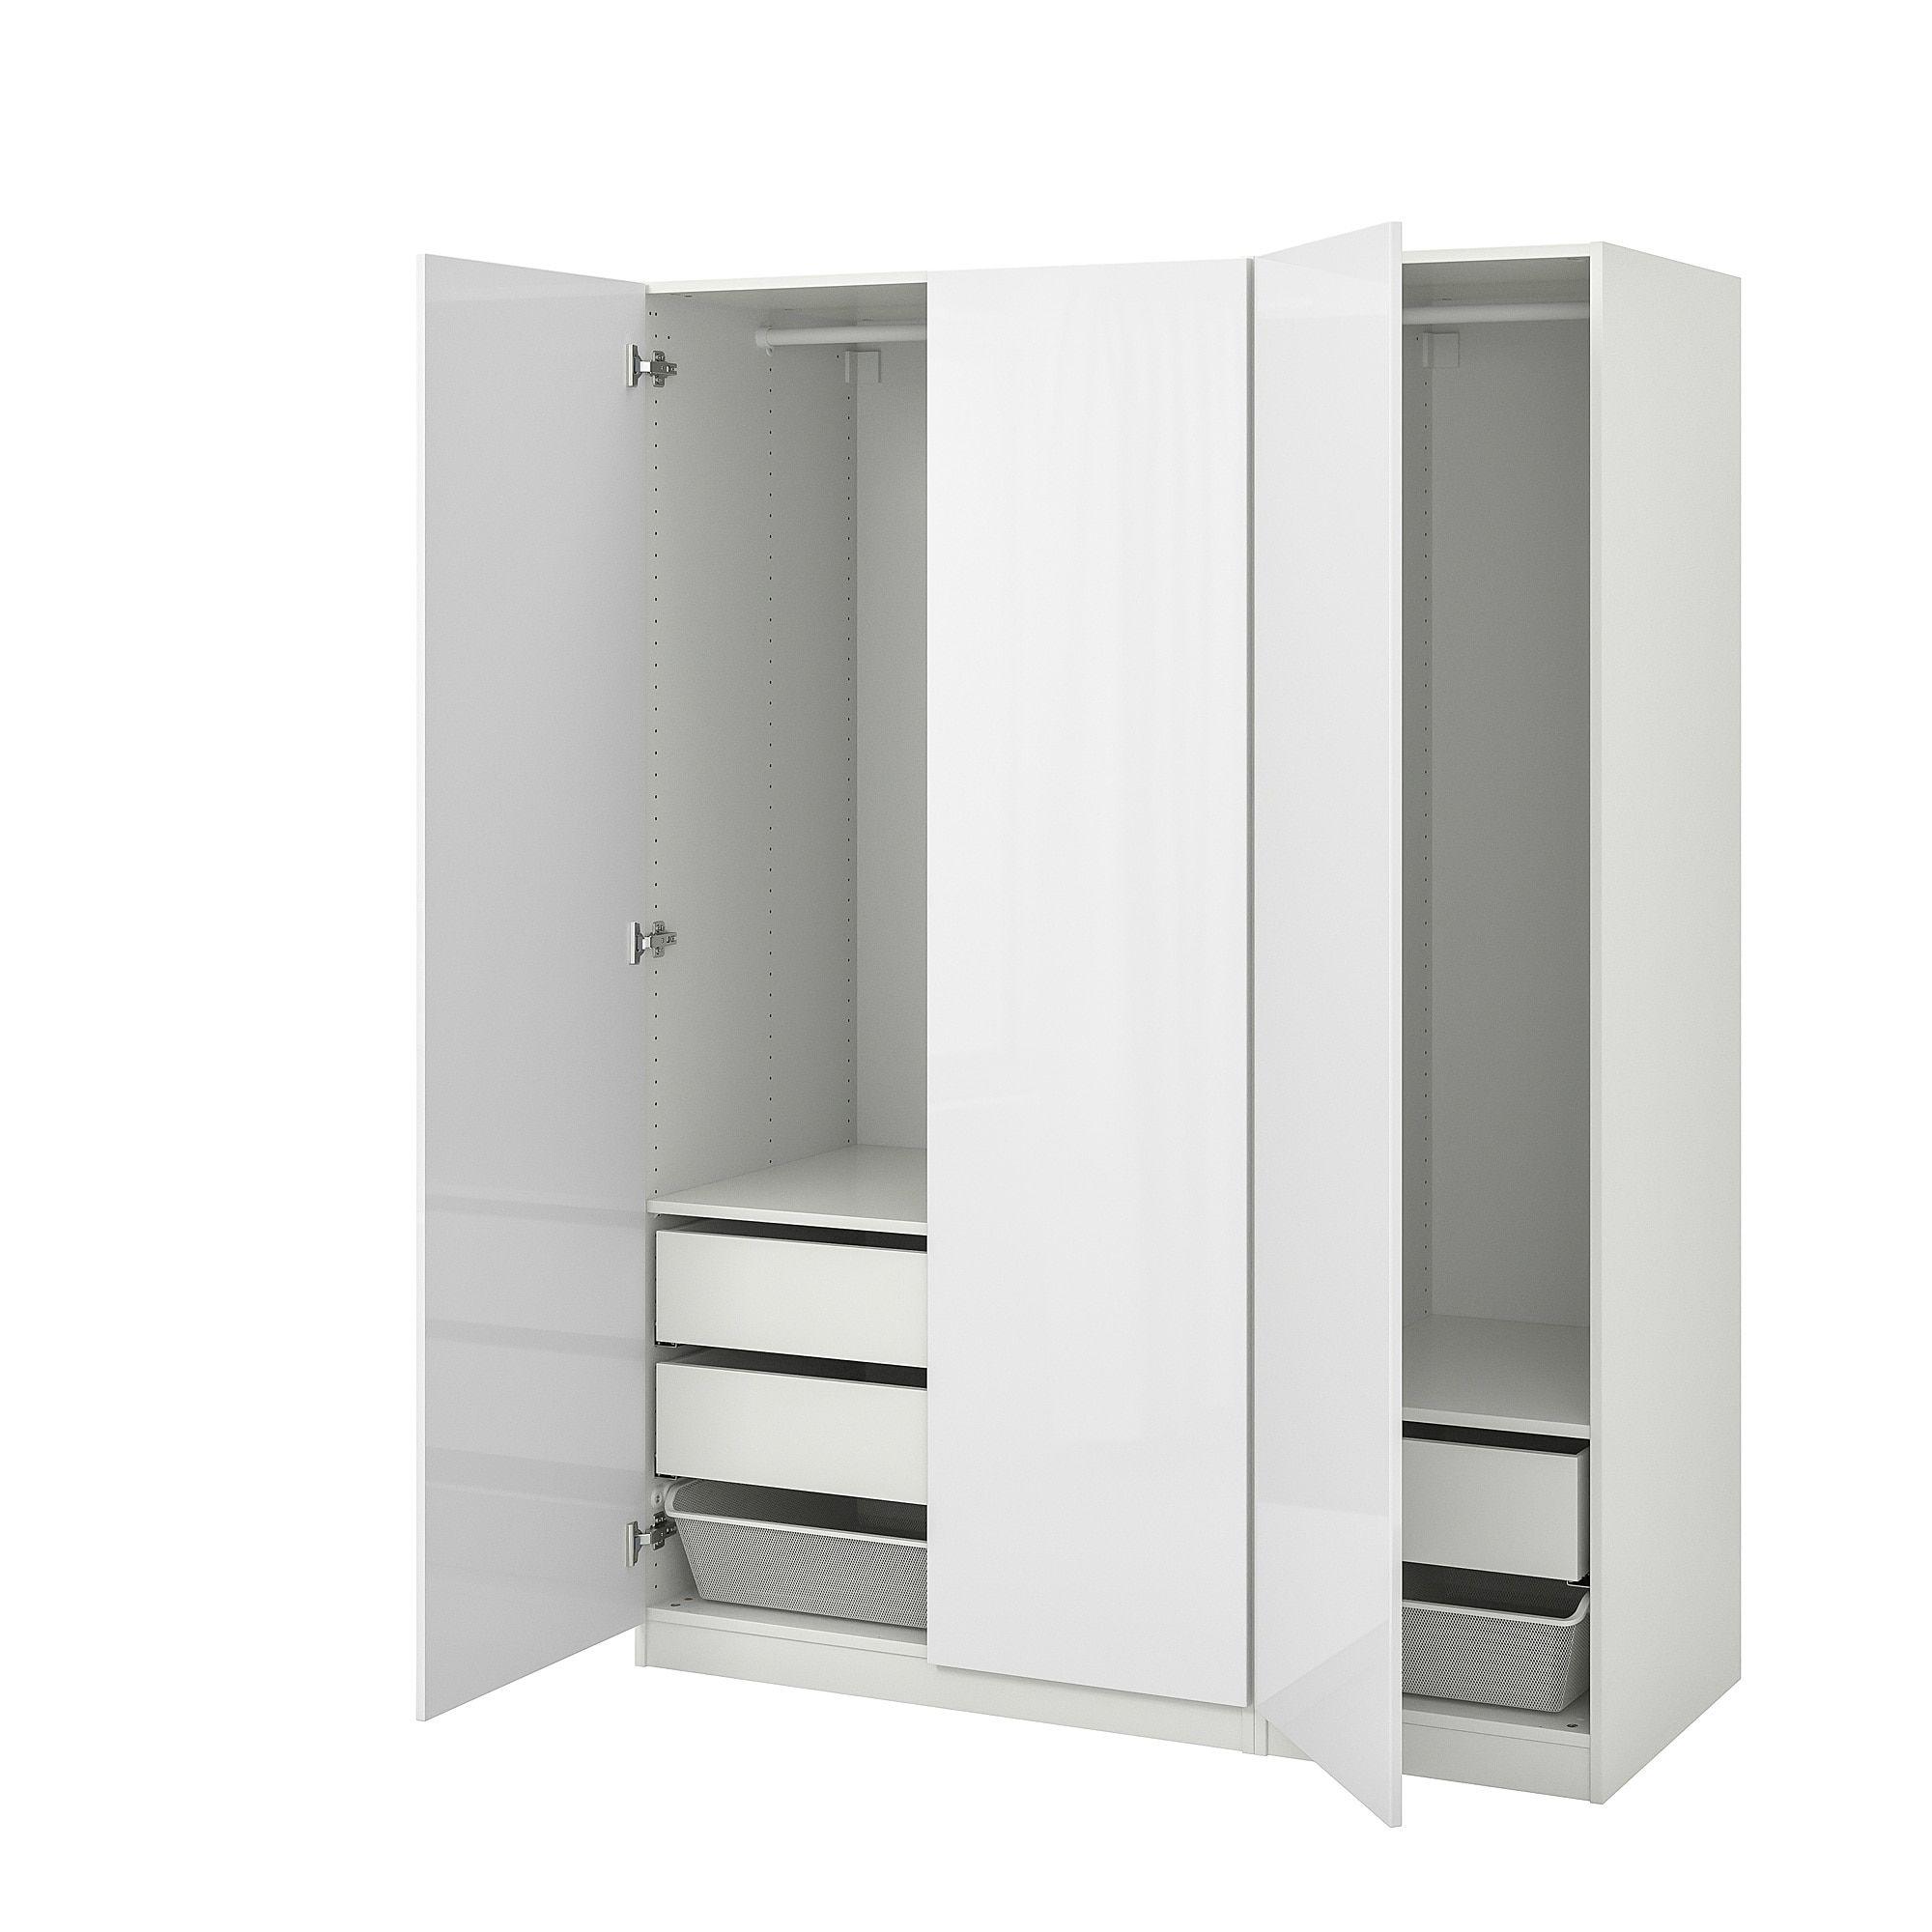 Pax Kleiderschrank Weiss Fardal Hochglanz Weiss In 2019 Ikea Pax